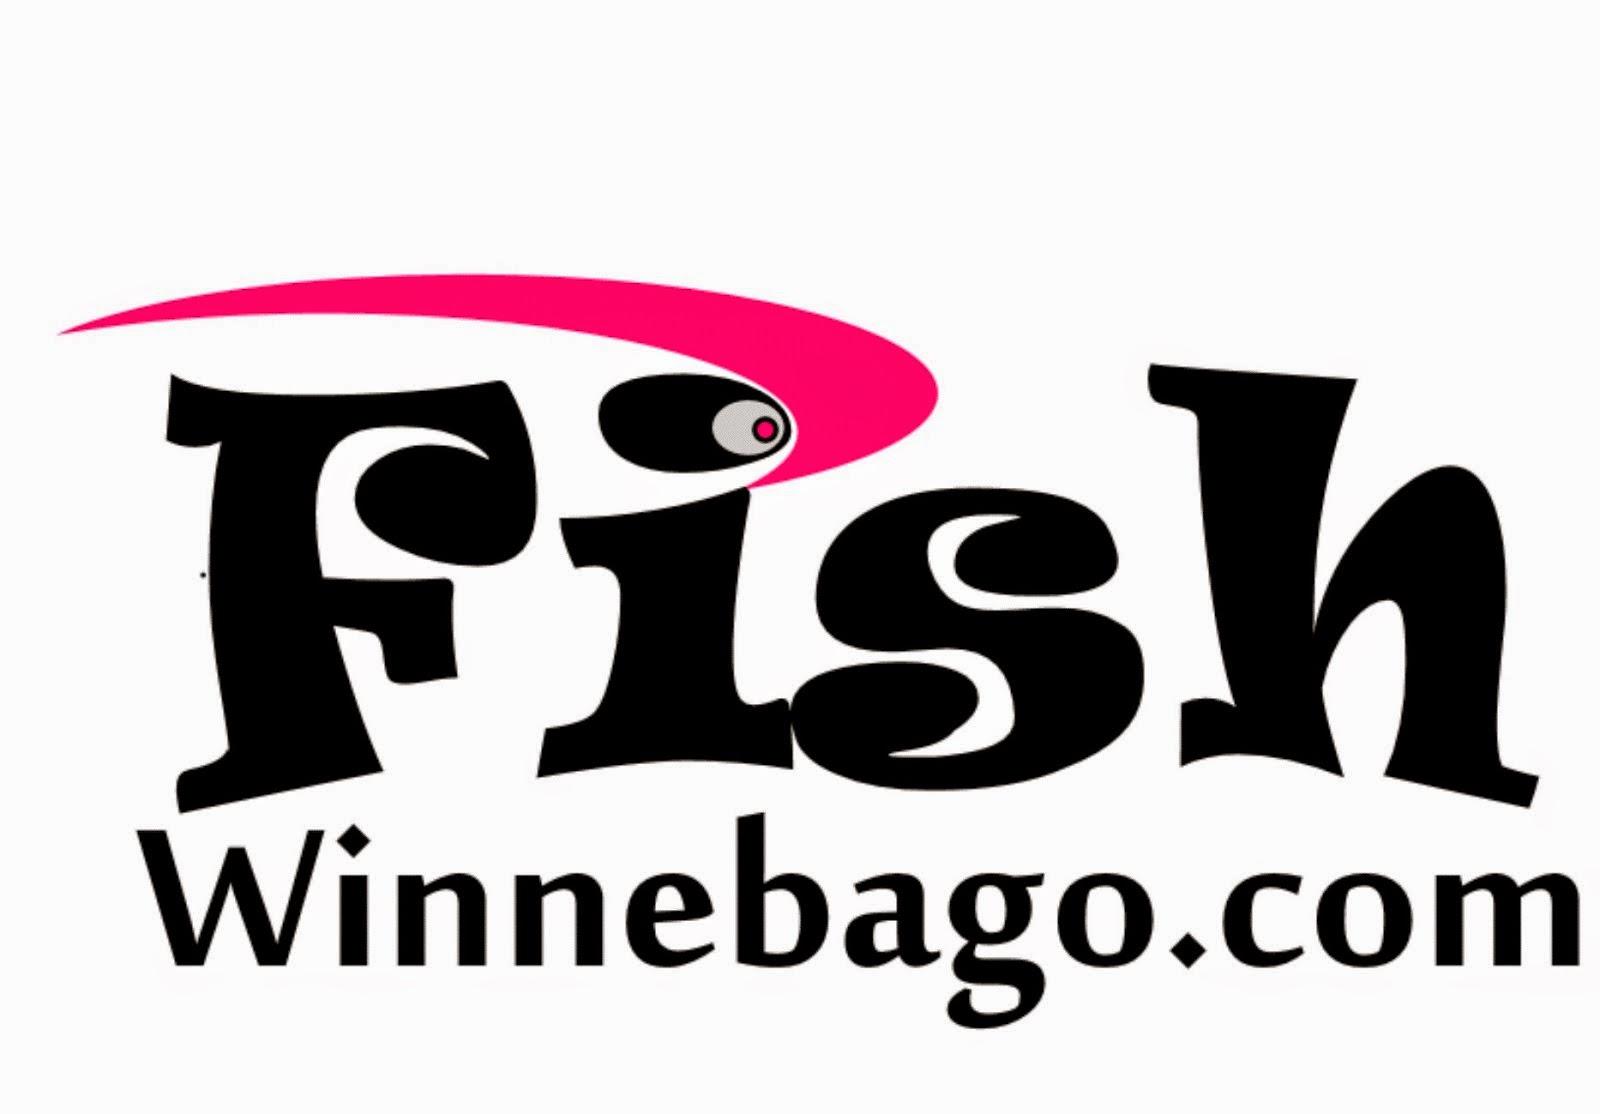 FishWinnebago.com